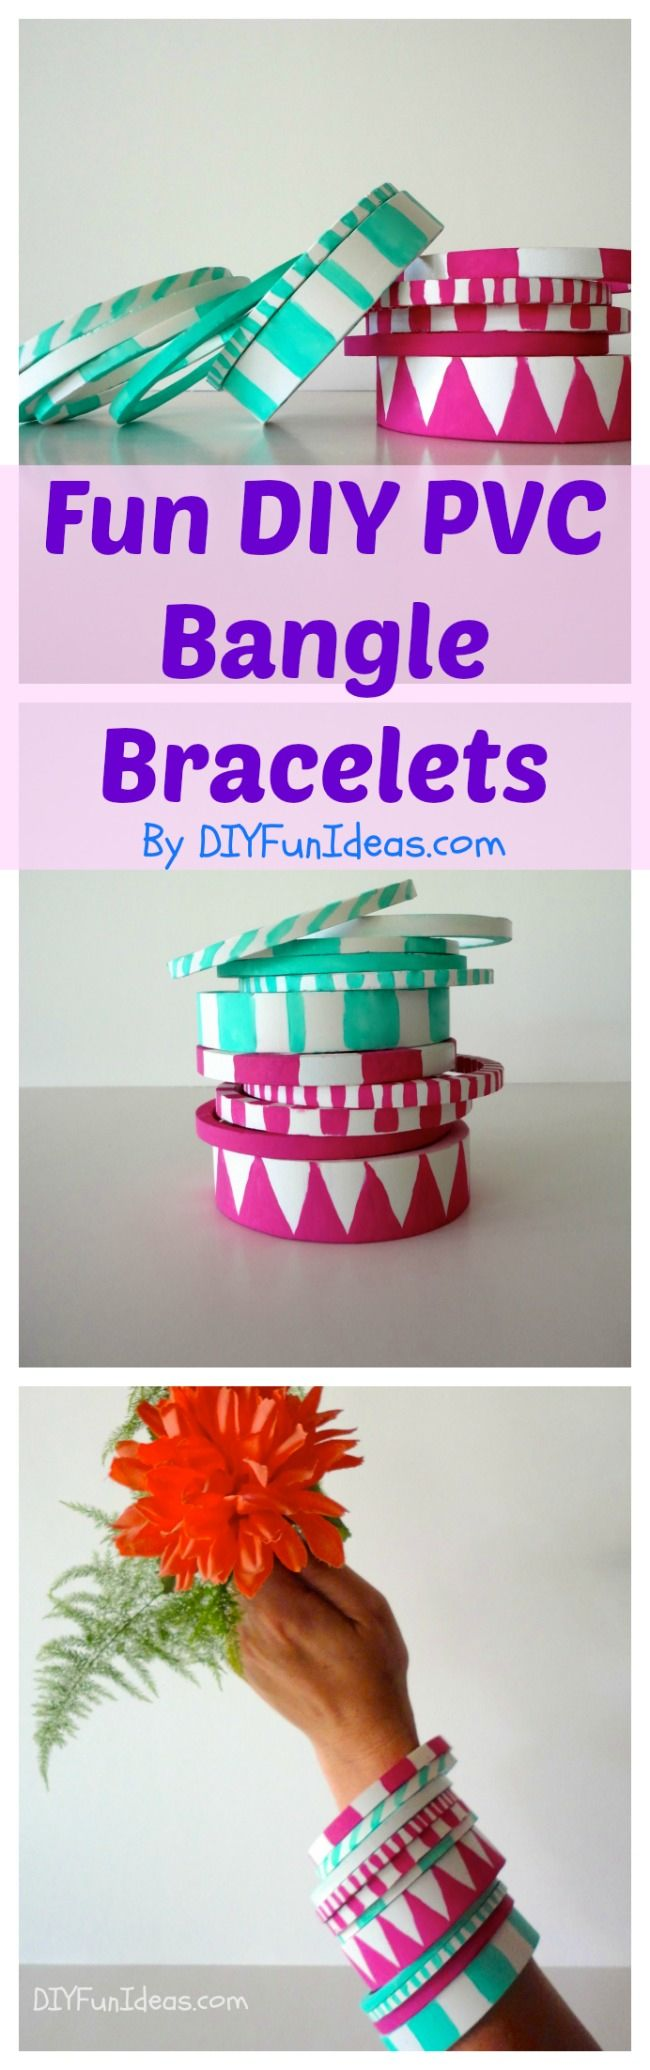 DIY PVC BRACELETS BANGLES